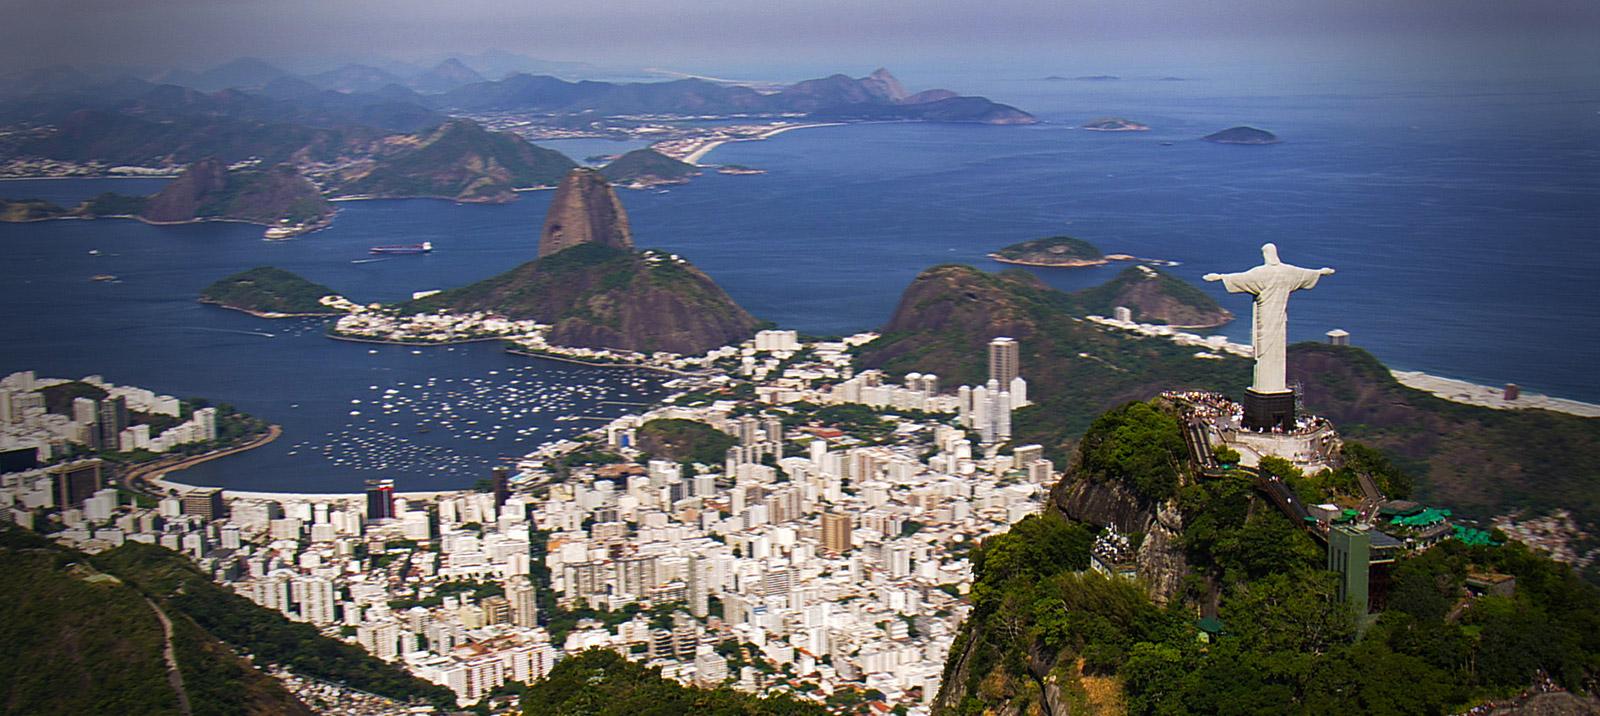 Brasil Visto de Cima